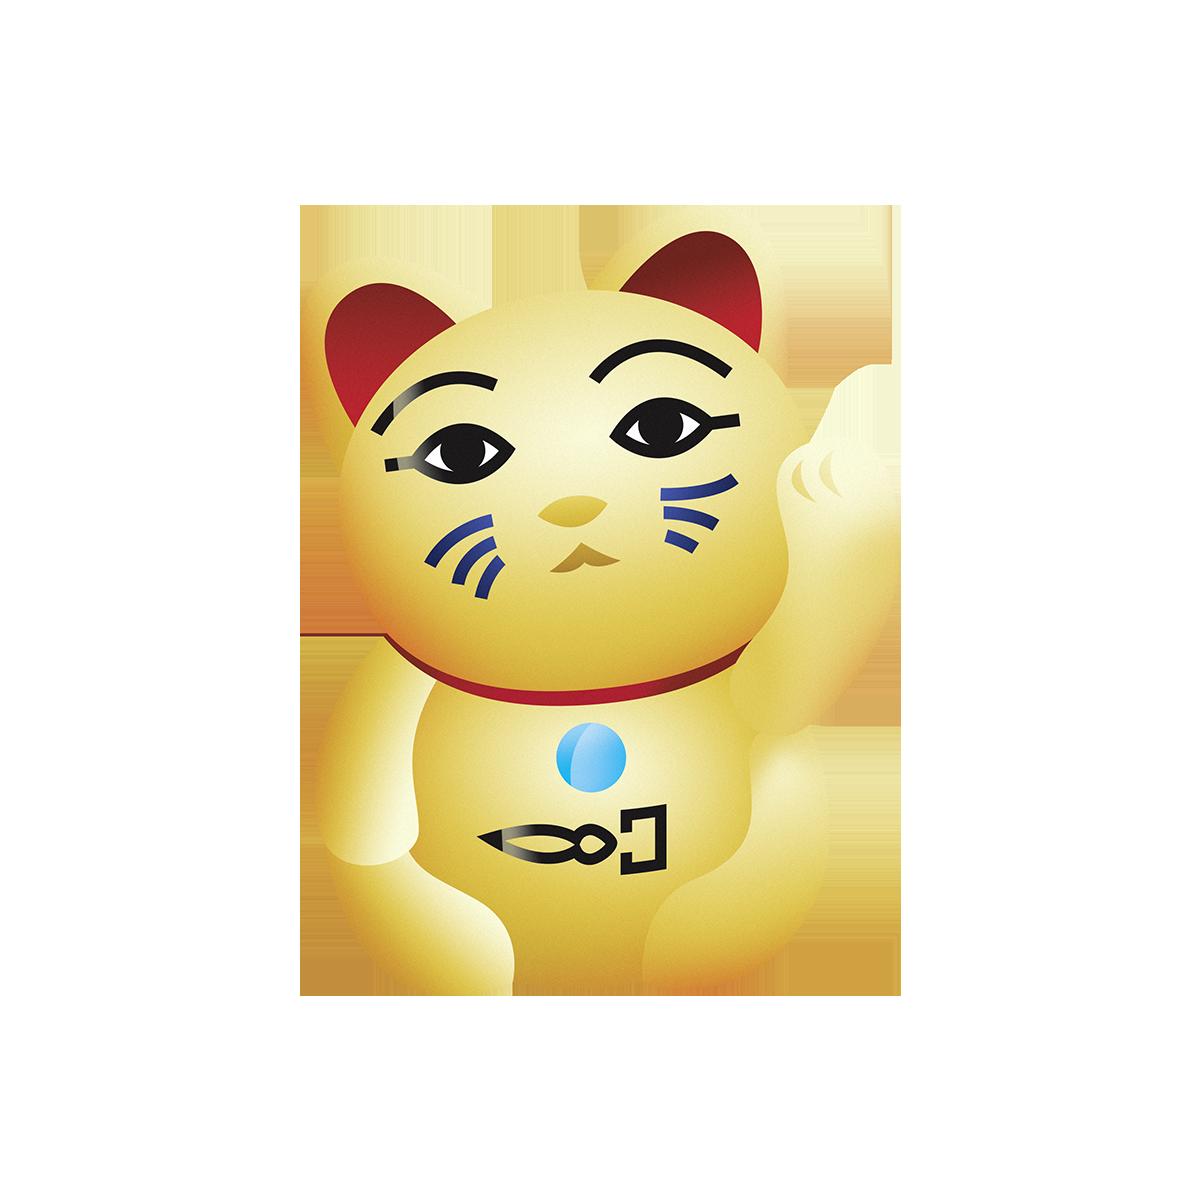 SEB_B-TBOE_eciRGB_05_Cat3